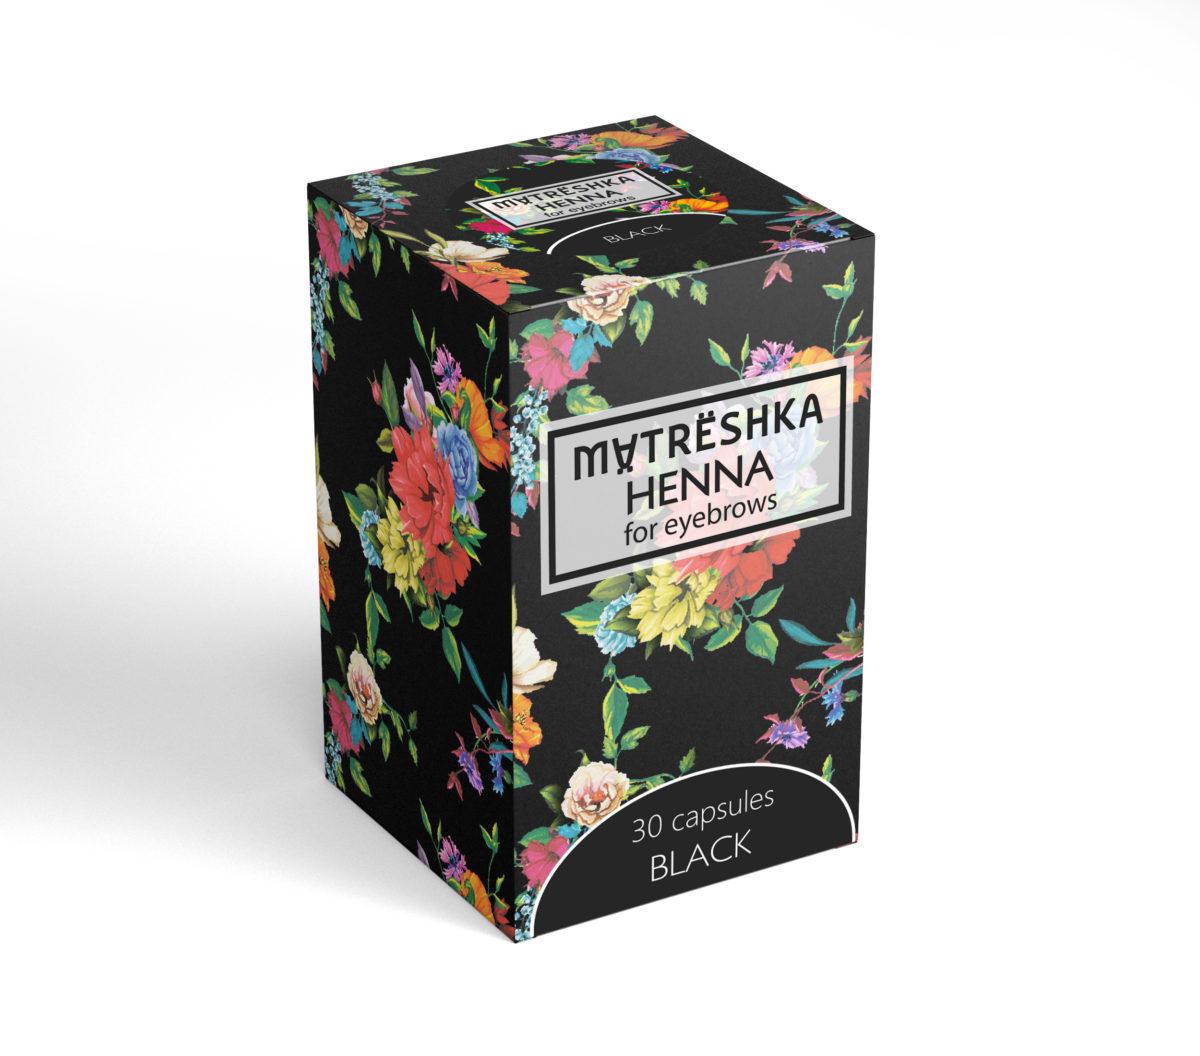 Matreshka Henna BLACK 30 kapsułek Henna pudrowa